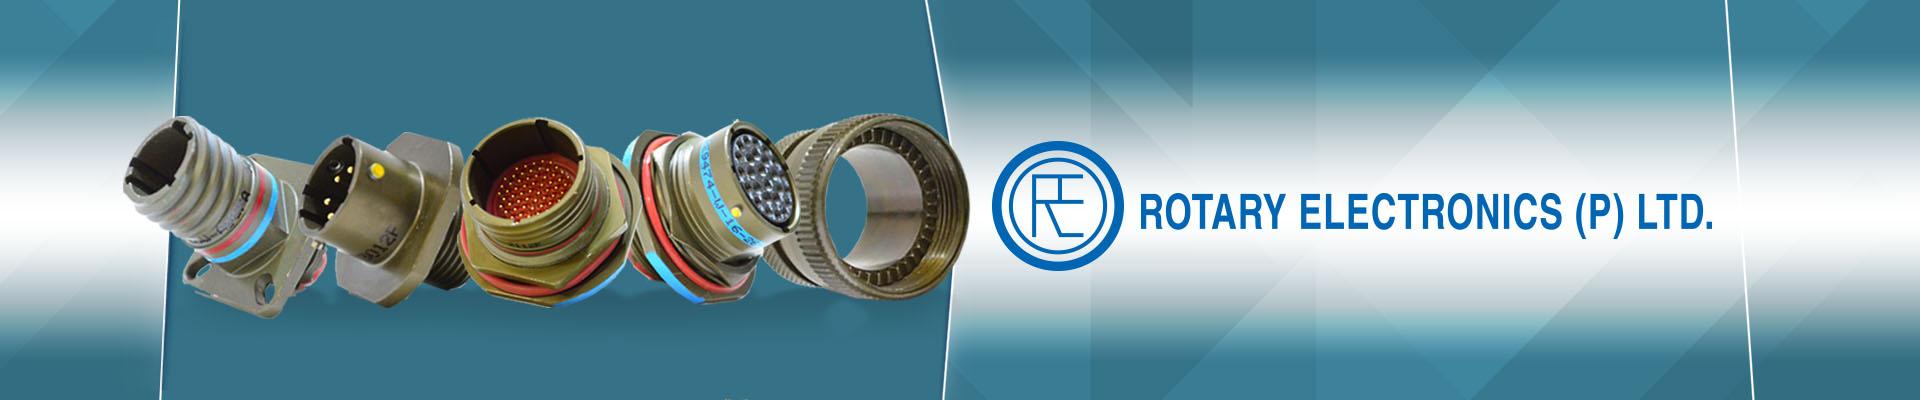 RotaryCon_Banner